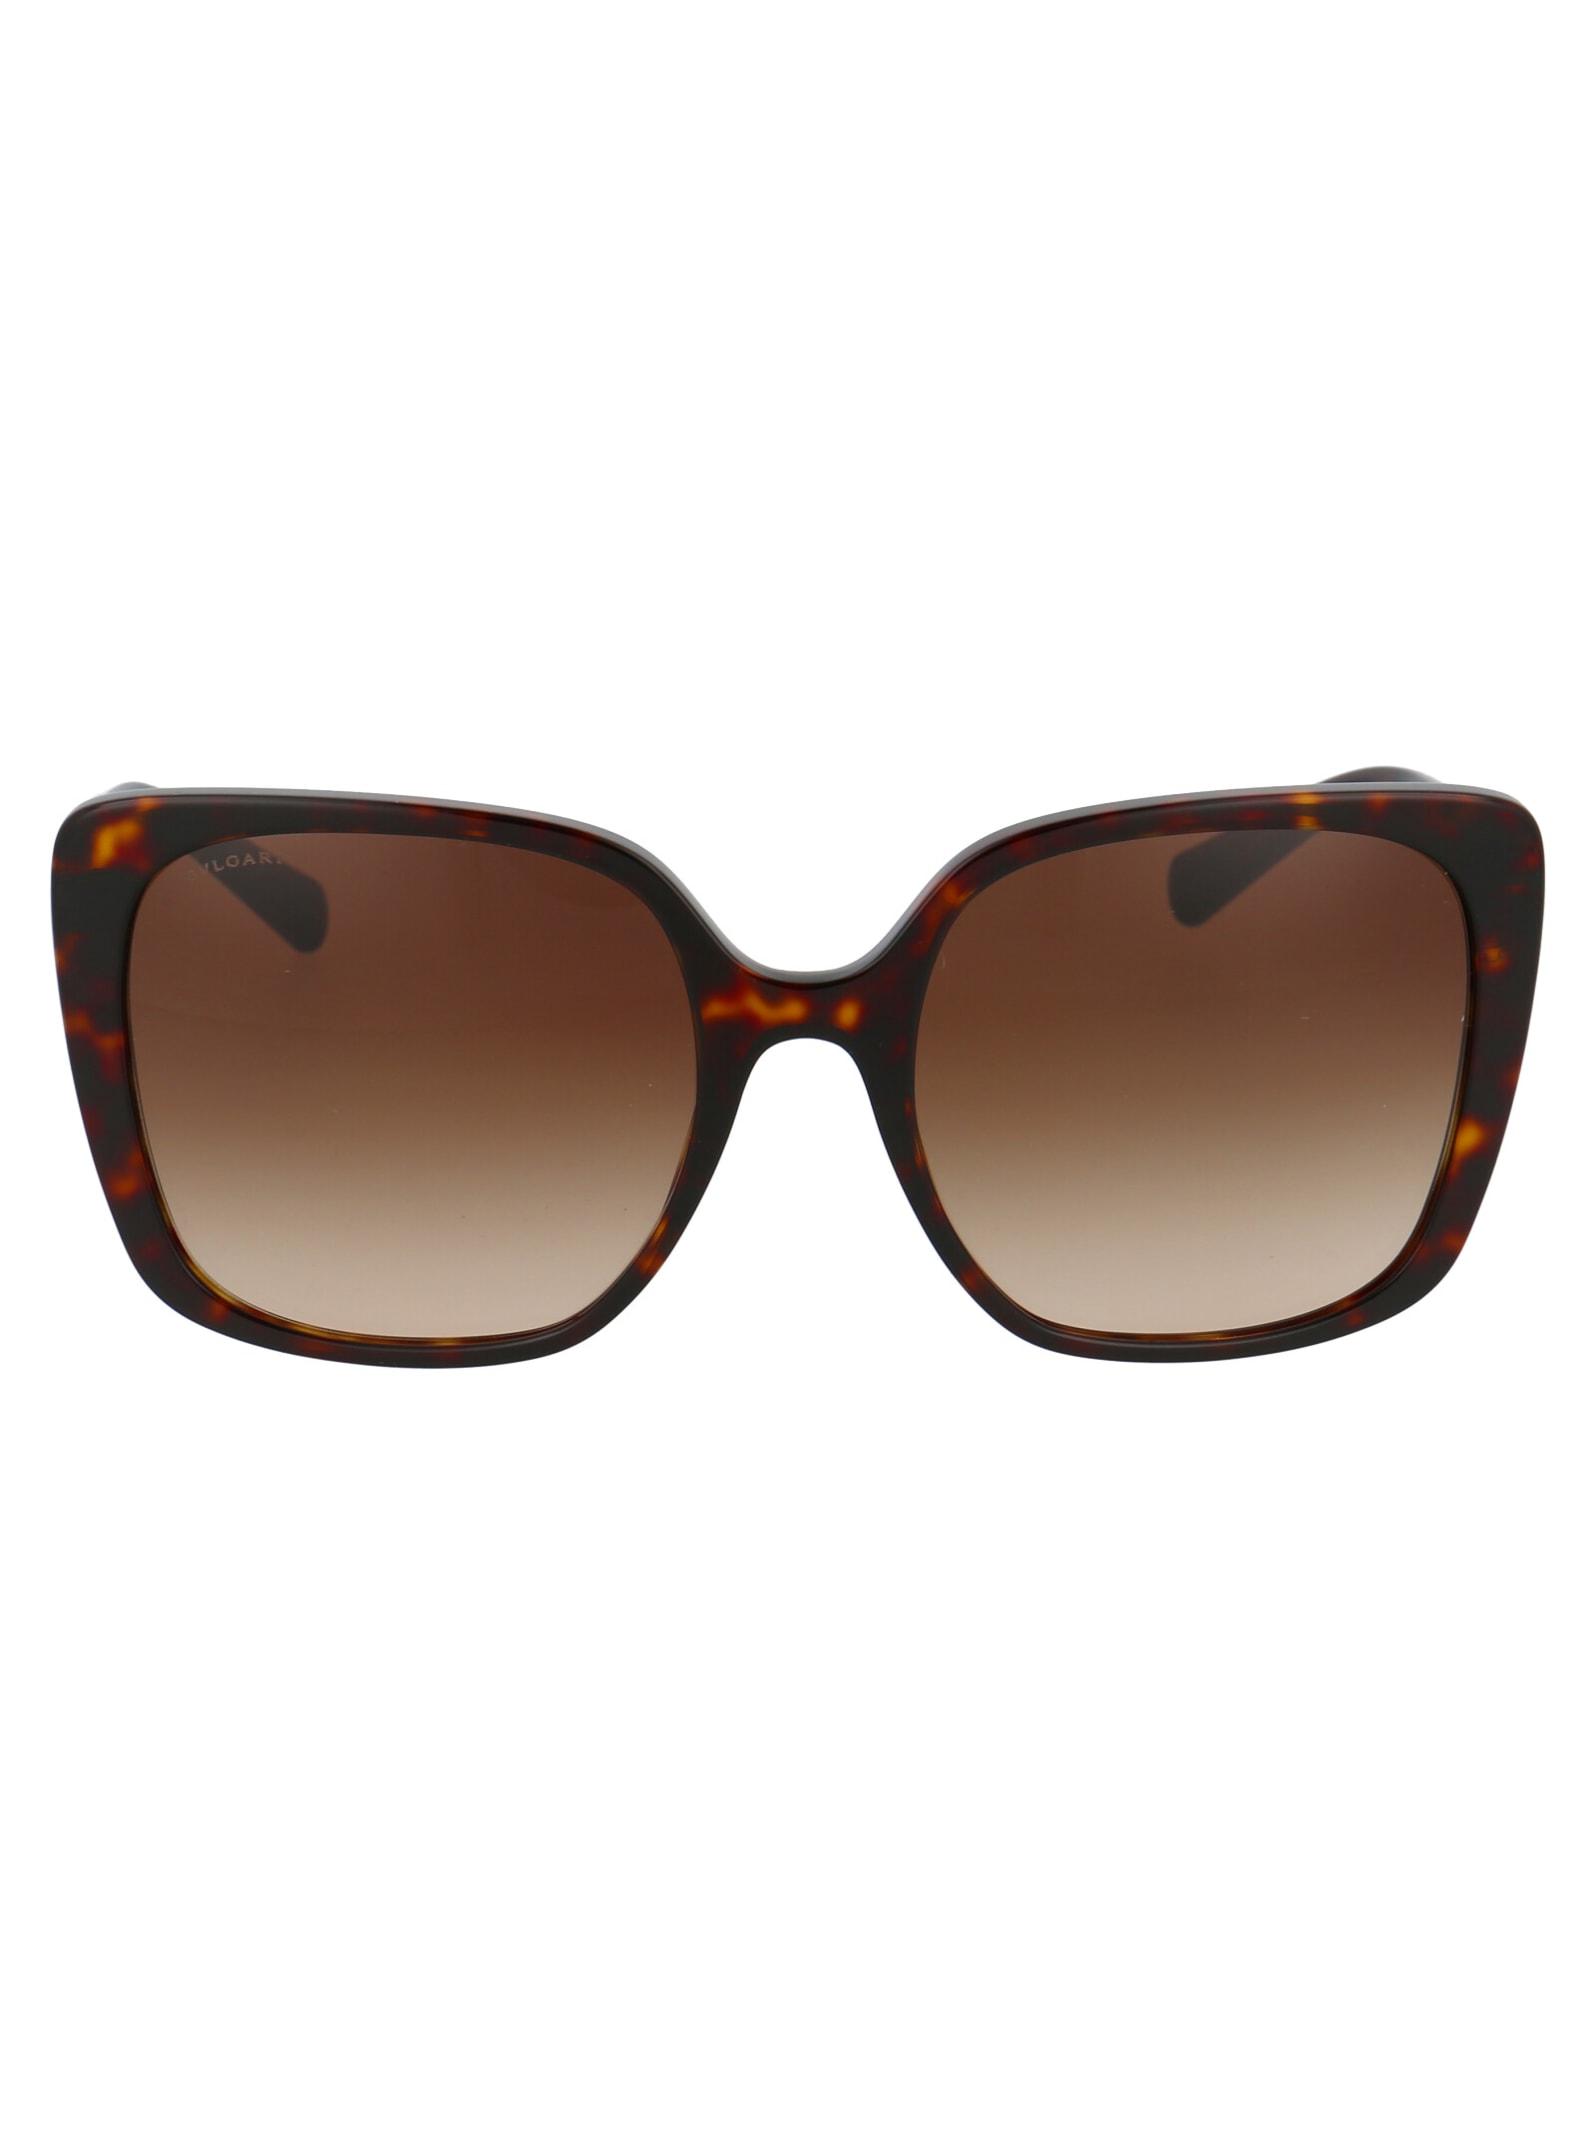 0bv8225b Sunglasses